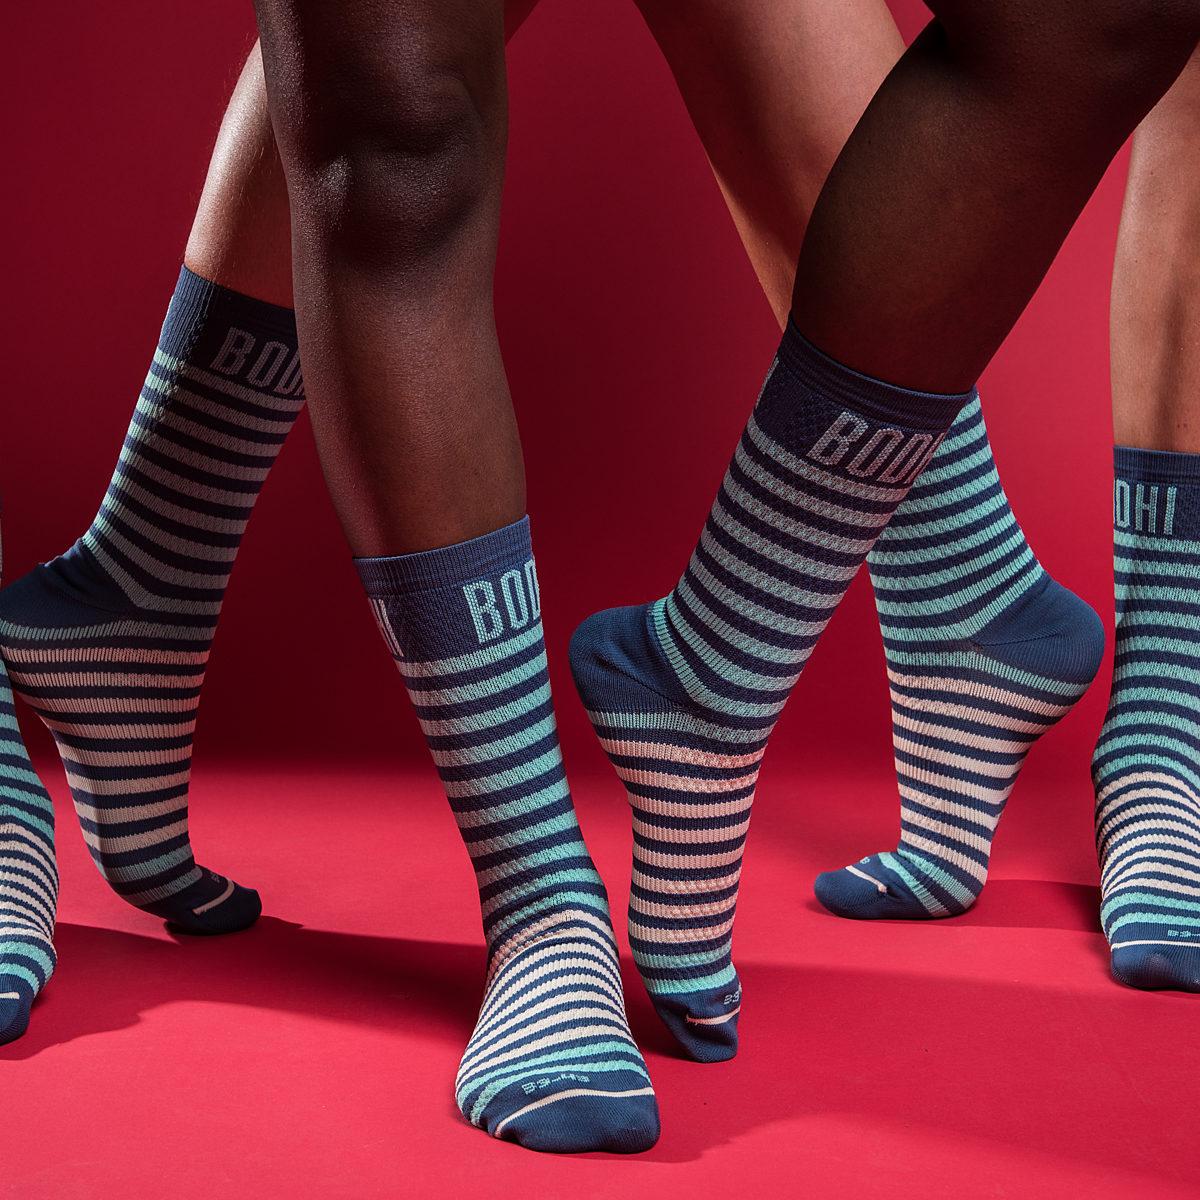 Bodhi cycling custom teamwear socks